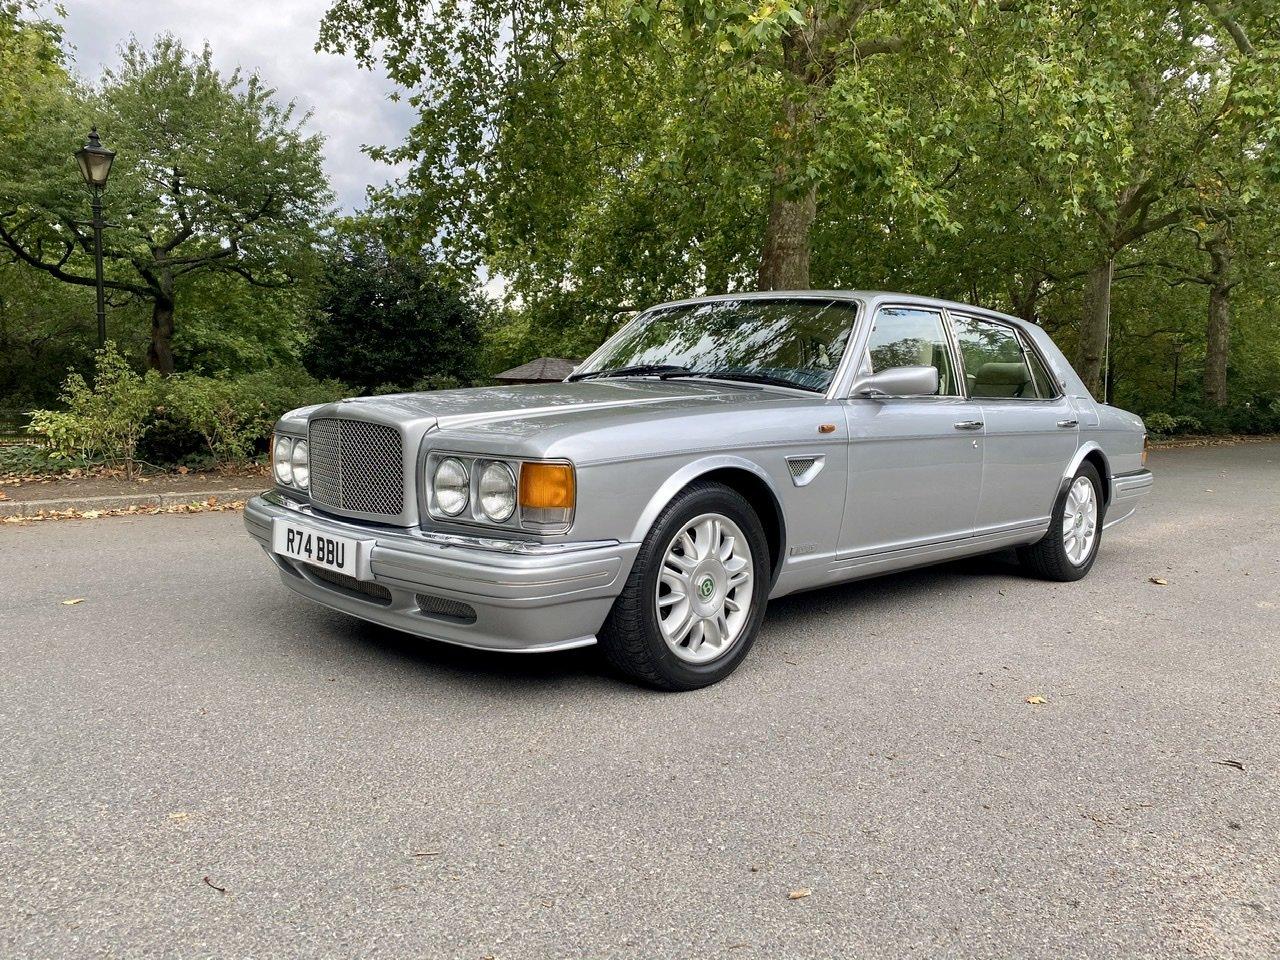 1998 Bentley Brooklands 'R' Mulliner For Sale (picture 2 of 22)